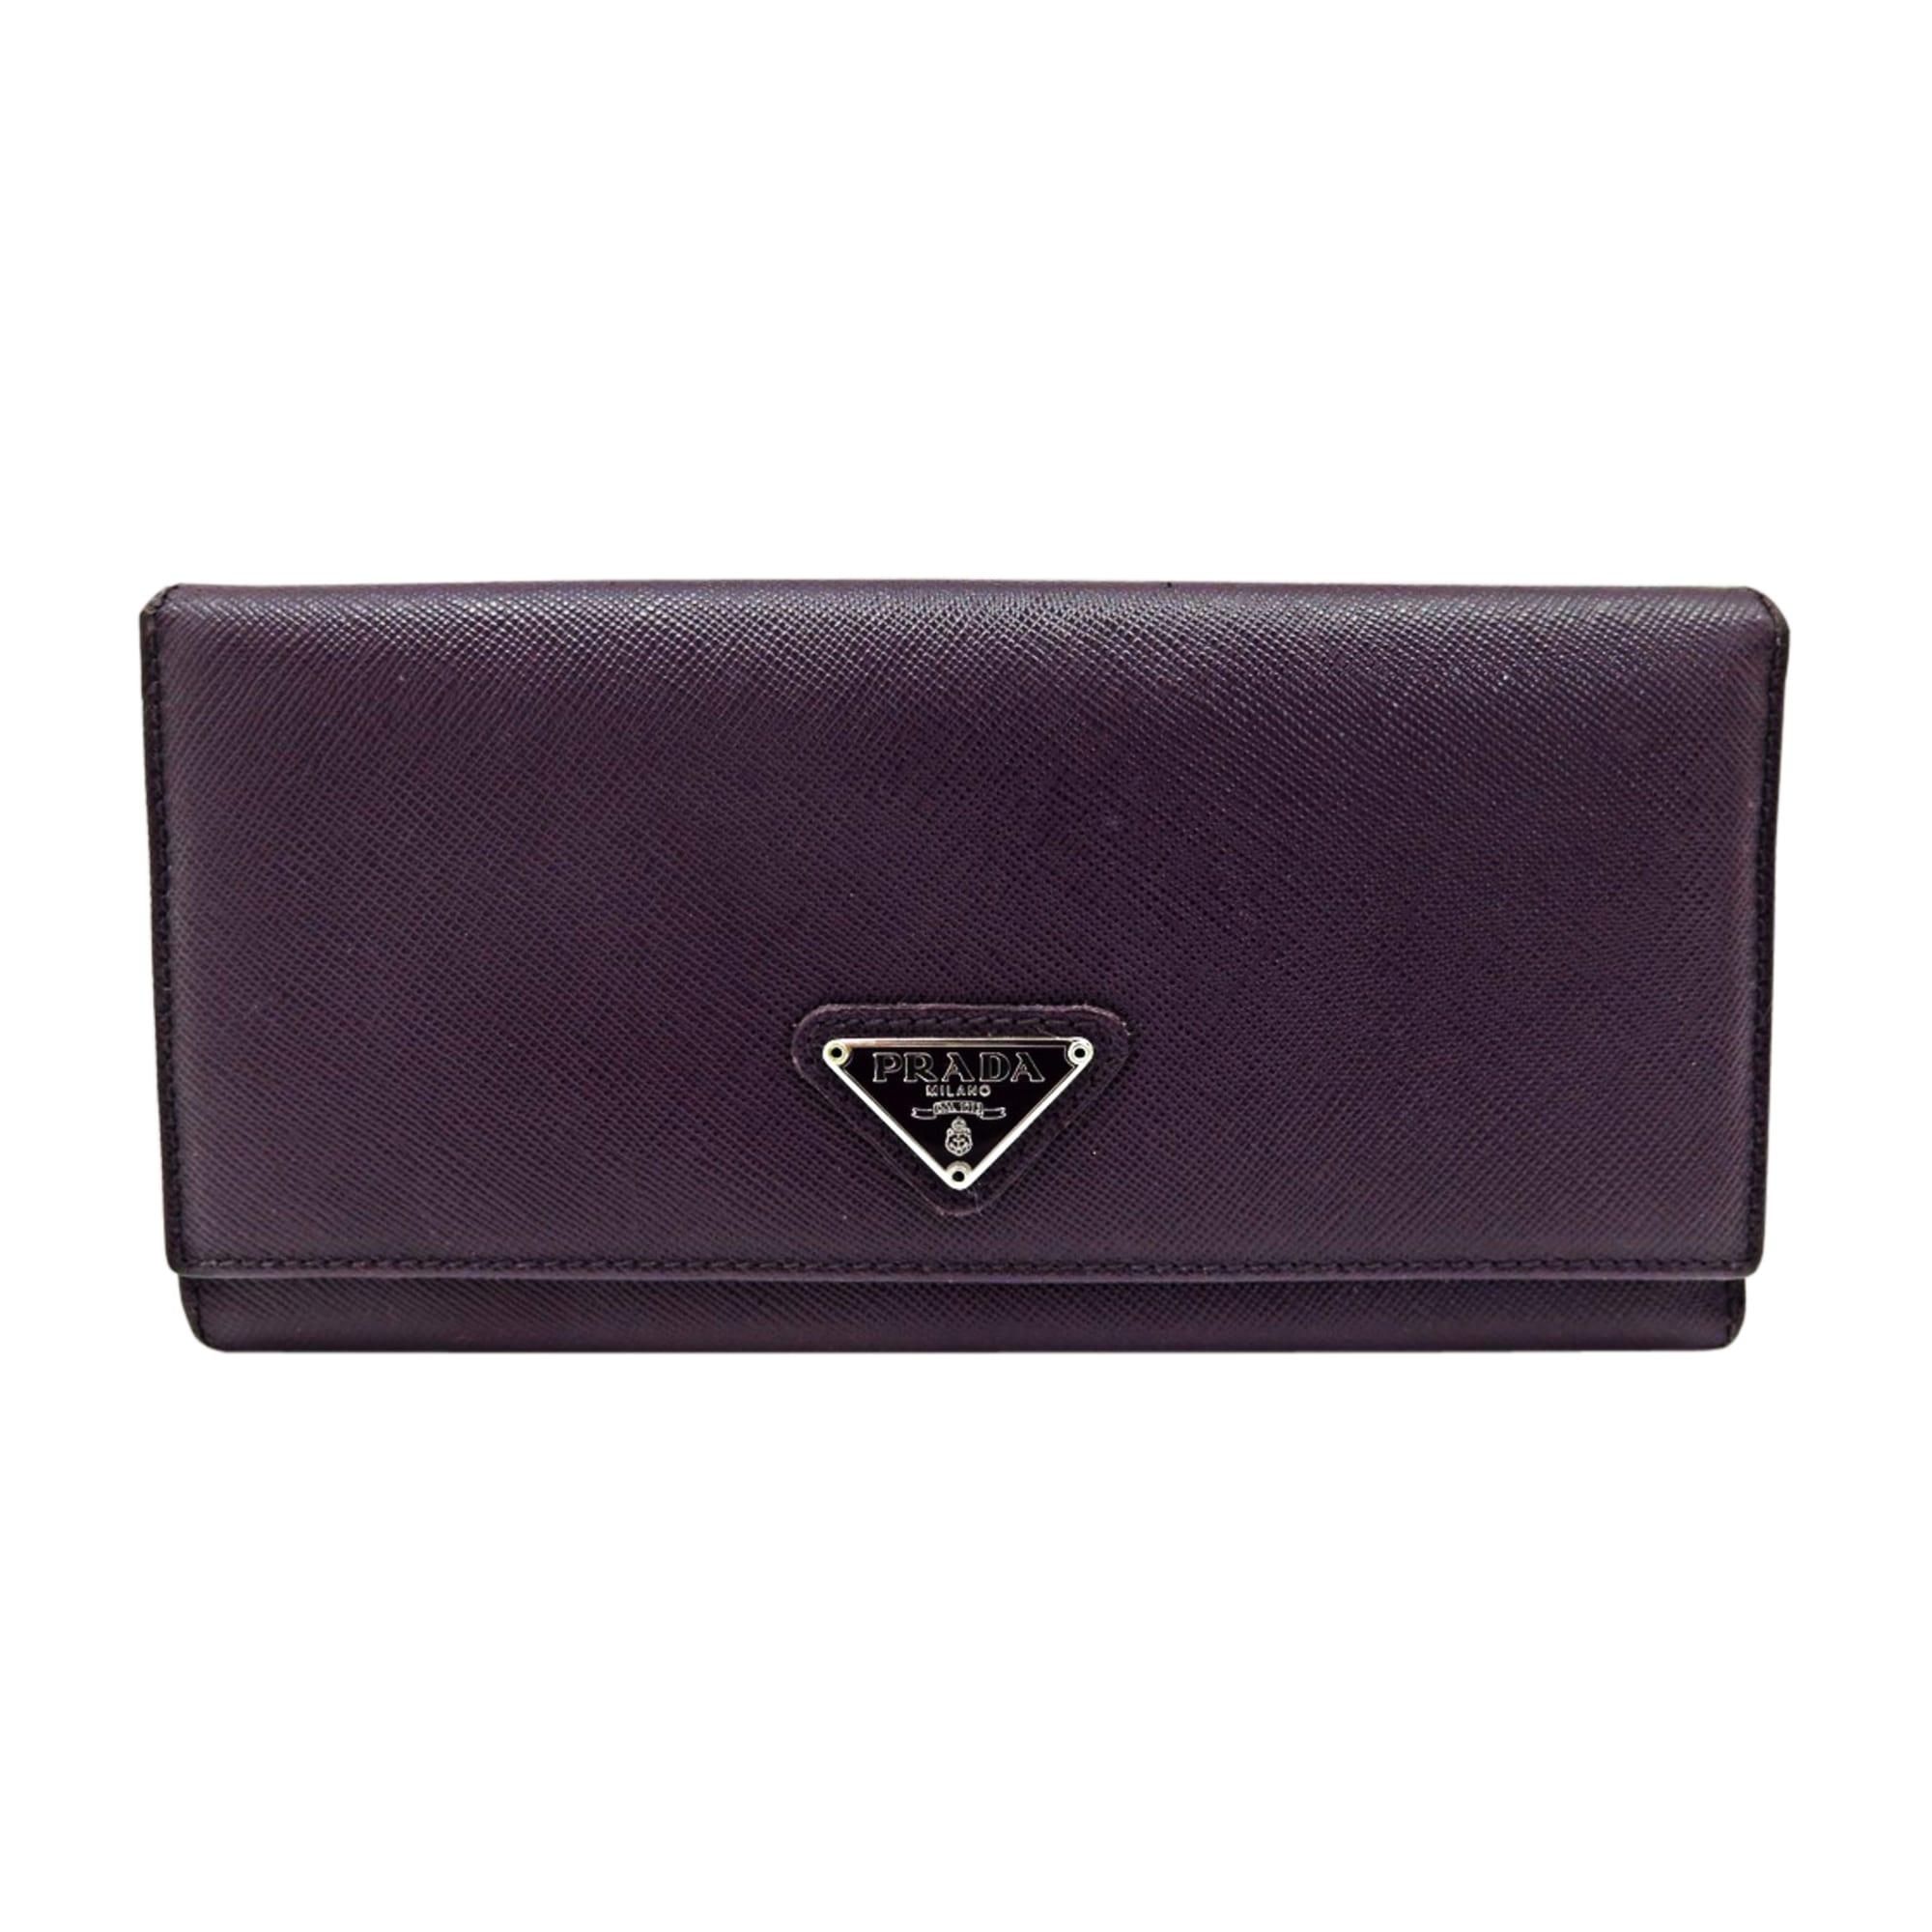 ce947b0ad2271a ... where can i buy wallet prada purple mauve lavender 41628 fea68